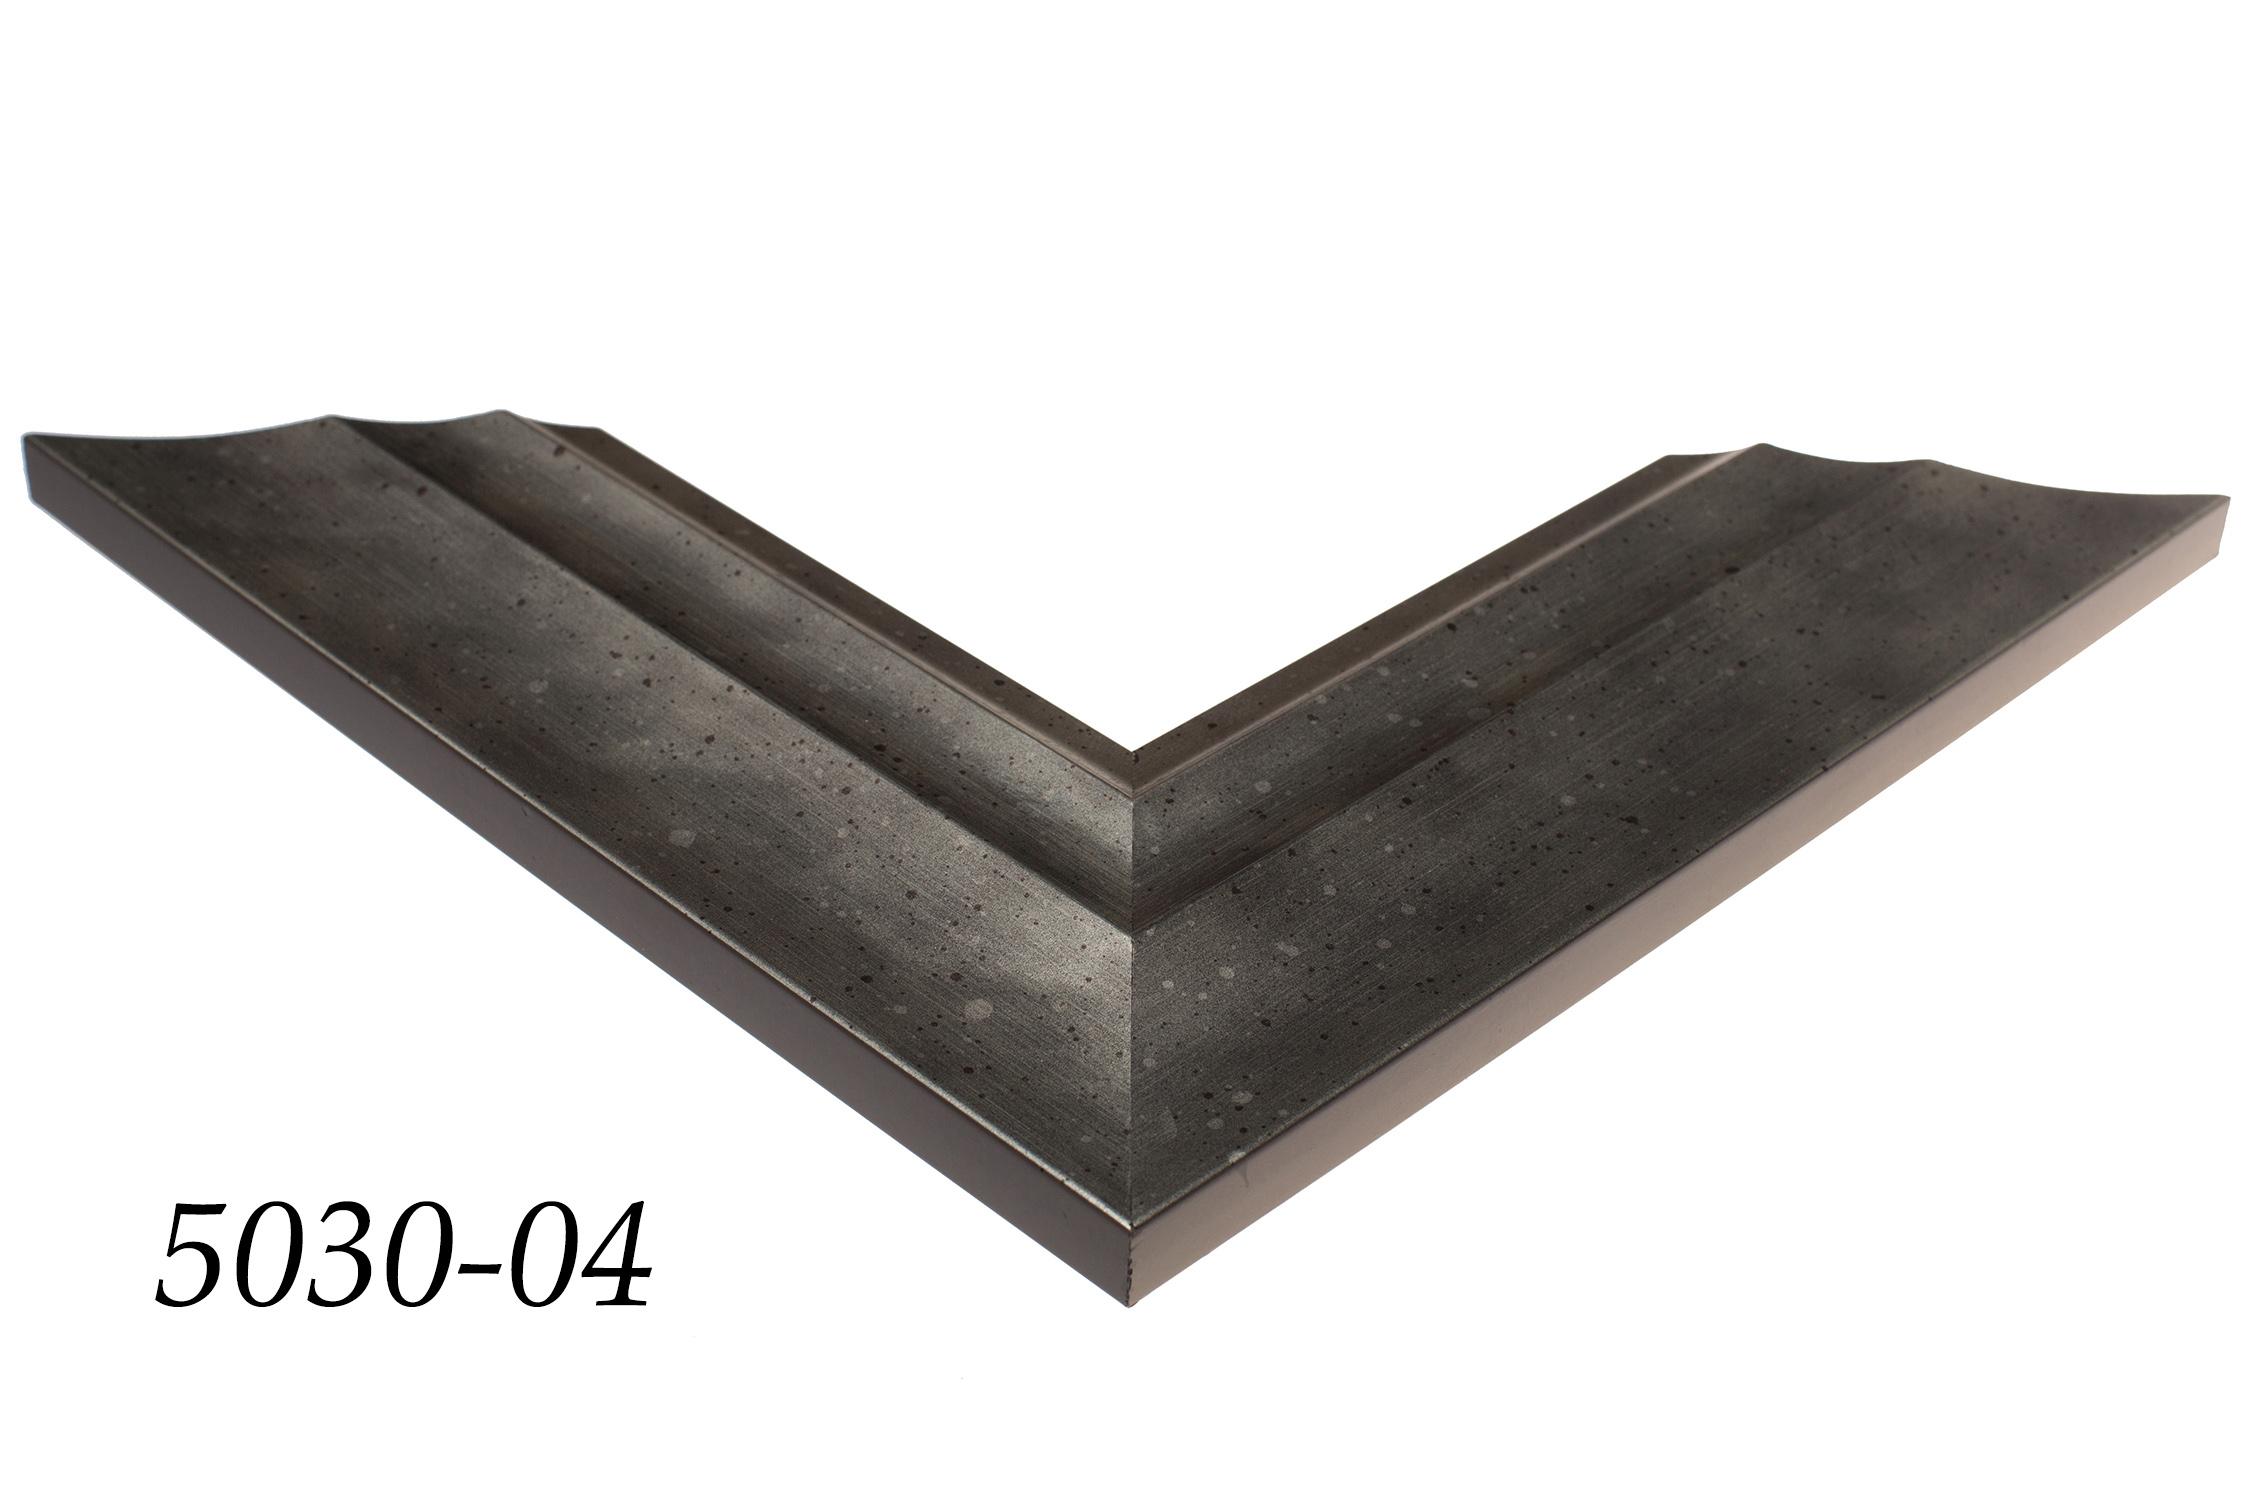 5030-04